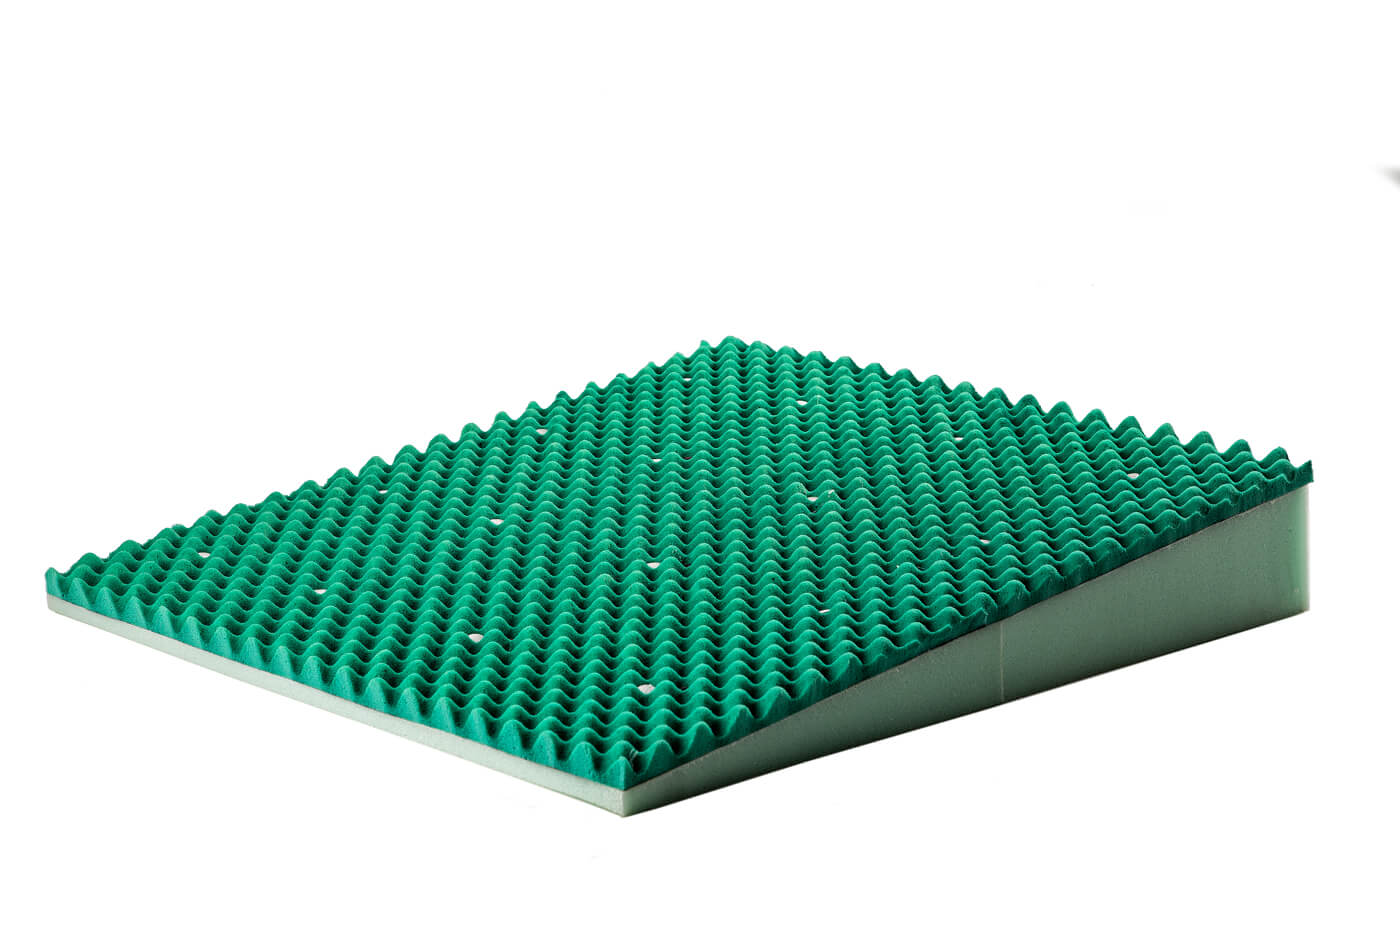 Almofada Anti Refluxo Magnética 70cm x 83cm x 14cm  - Kenko Premium Colchões